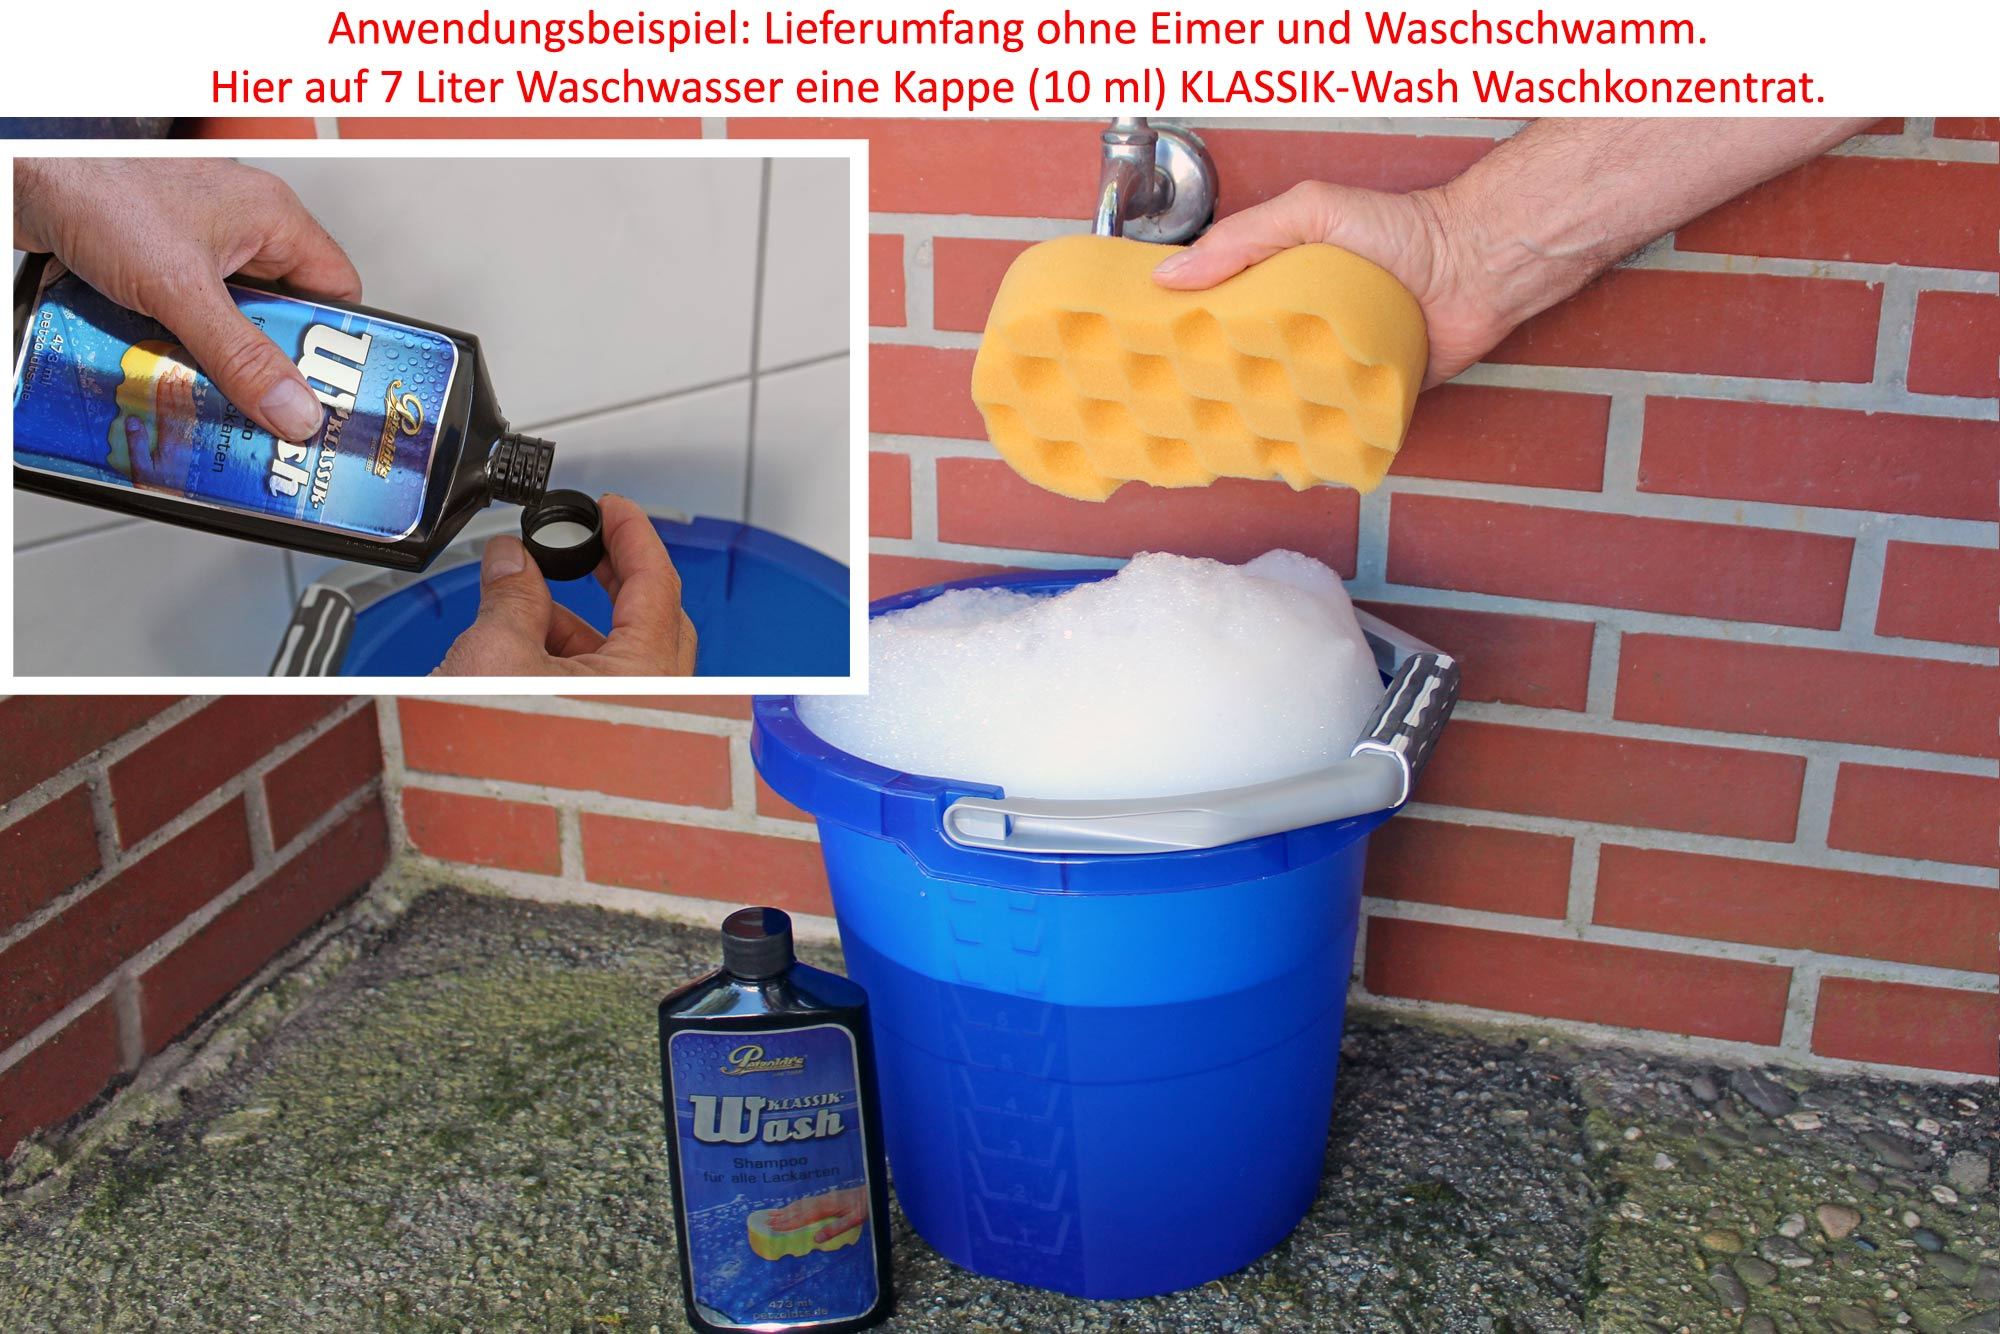 Petzoldts KLASSIK-Lackpflegeset, mit KLASSIK-Glass, KLASSIK-Wash